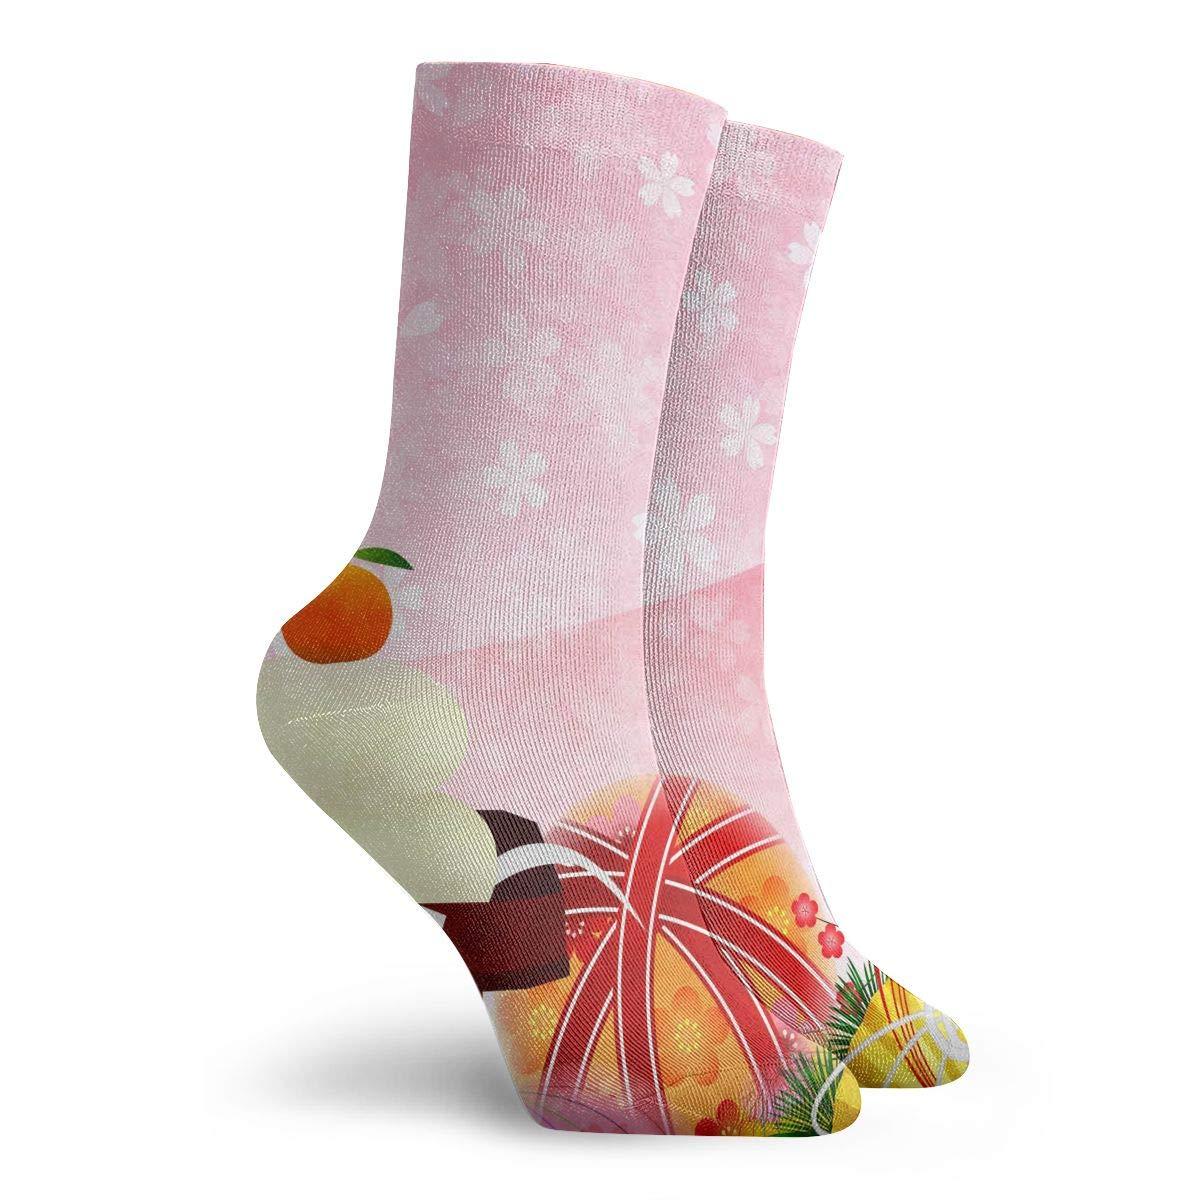 WEEDKEYCAT Japanese Fan Sushi Crane Adult Short Socks Cotton Gym Socks for Mens Womens Yoga Hiking Cycling Running Soccer Sports